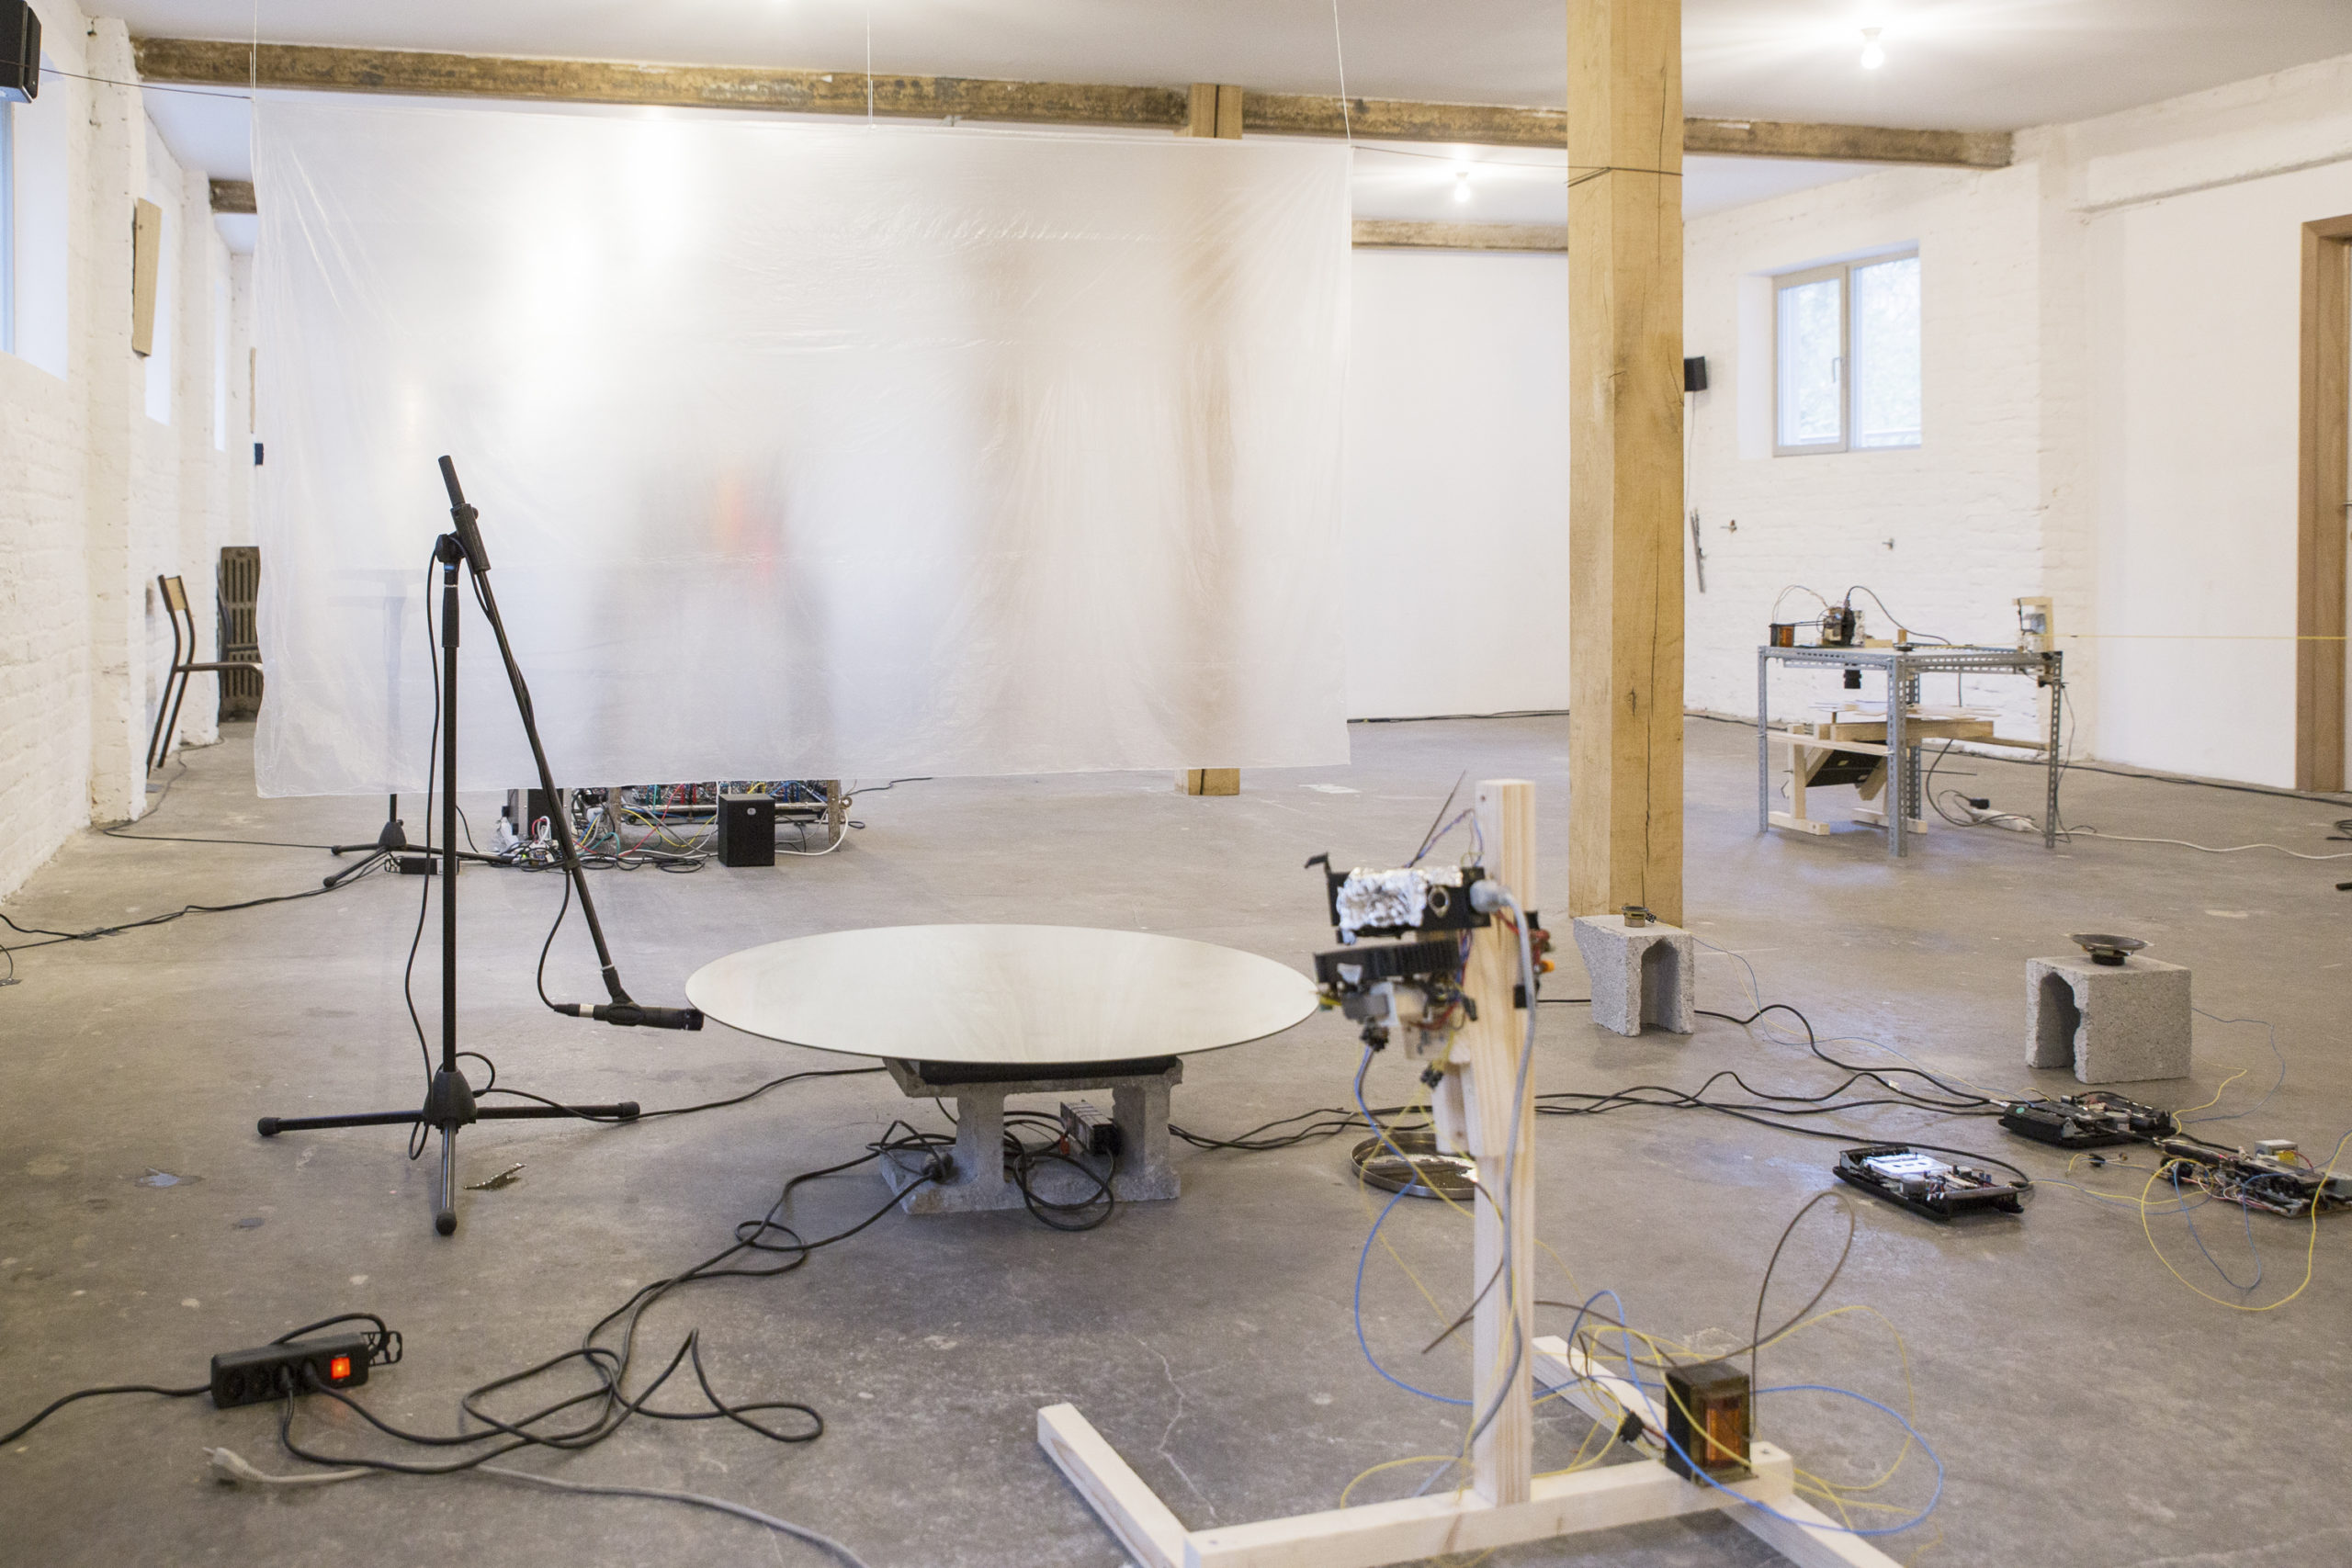 02_stations_cinetiques_diffusion_2020 @ Basile Richon